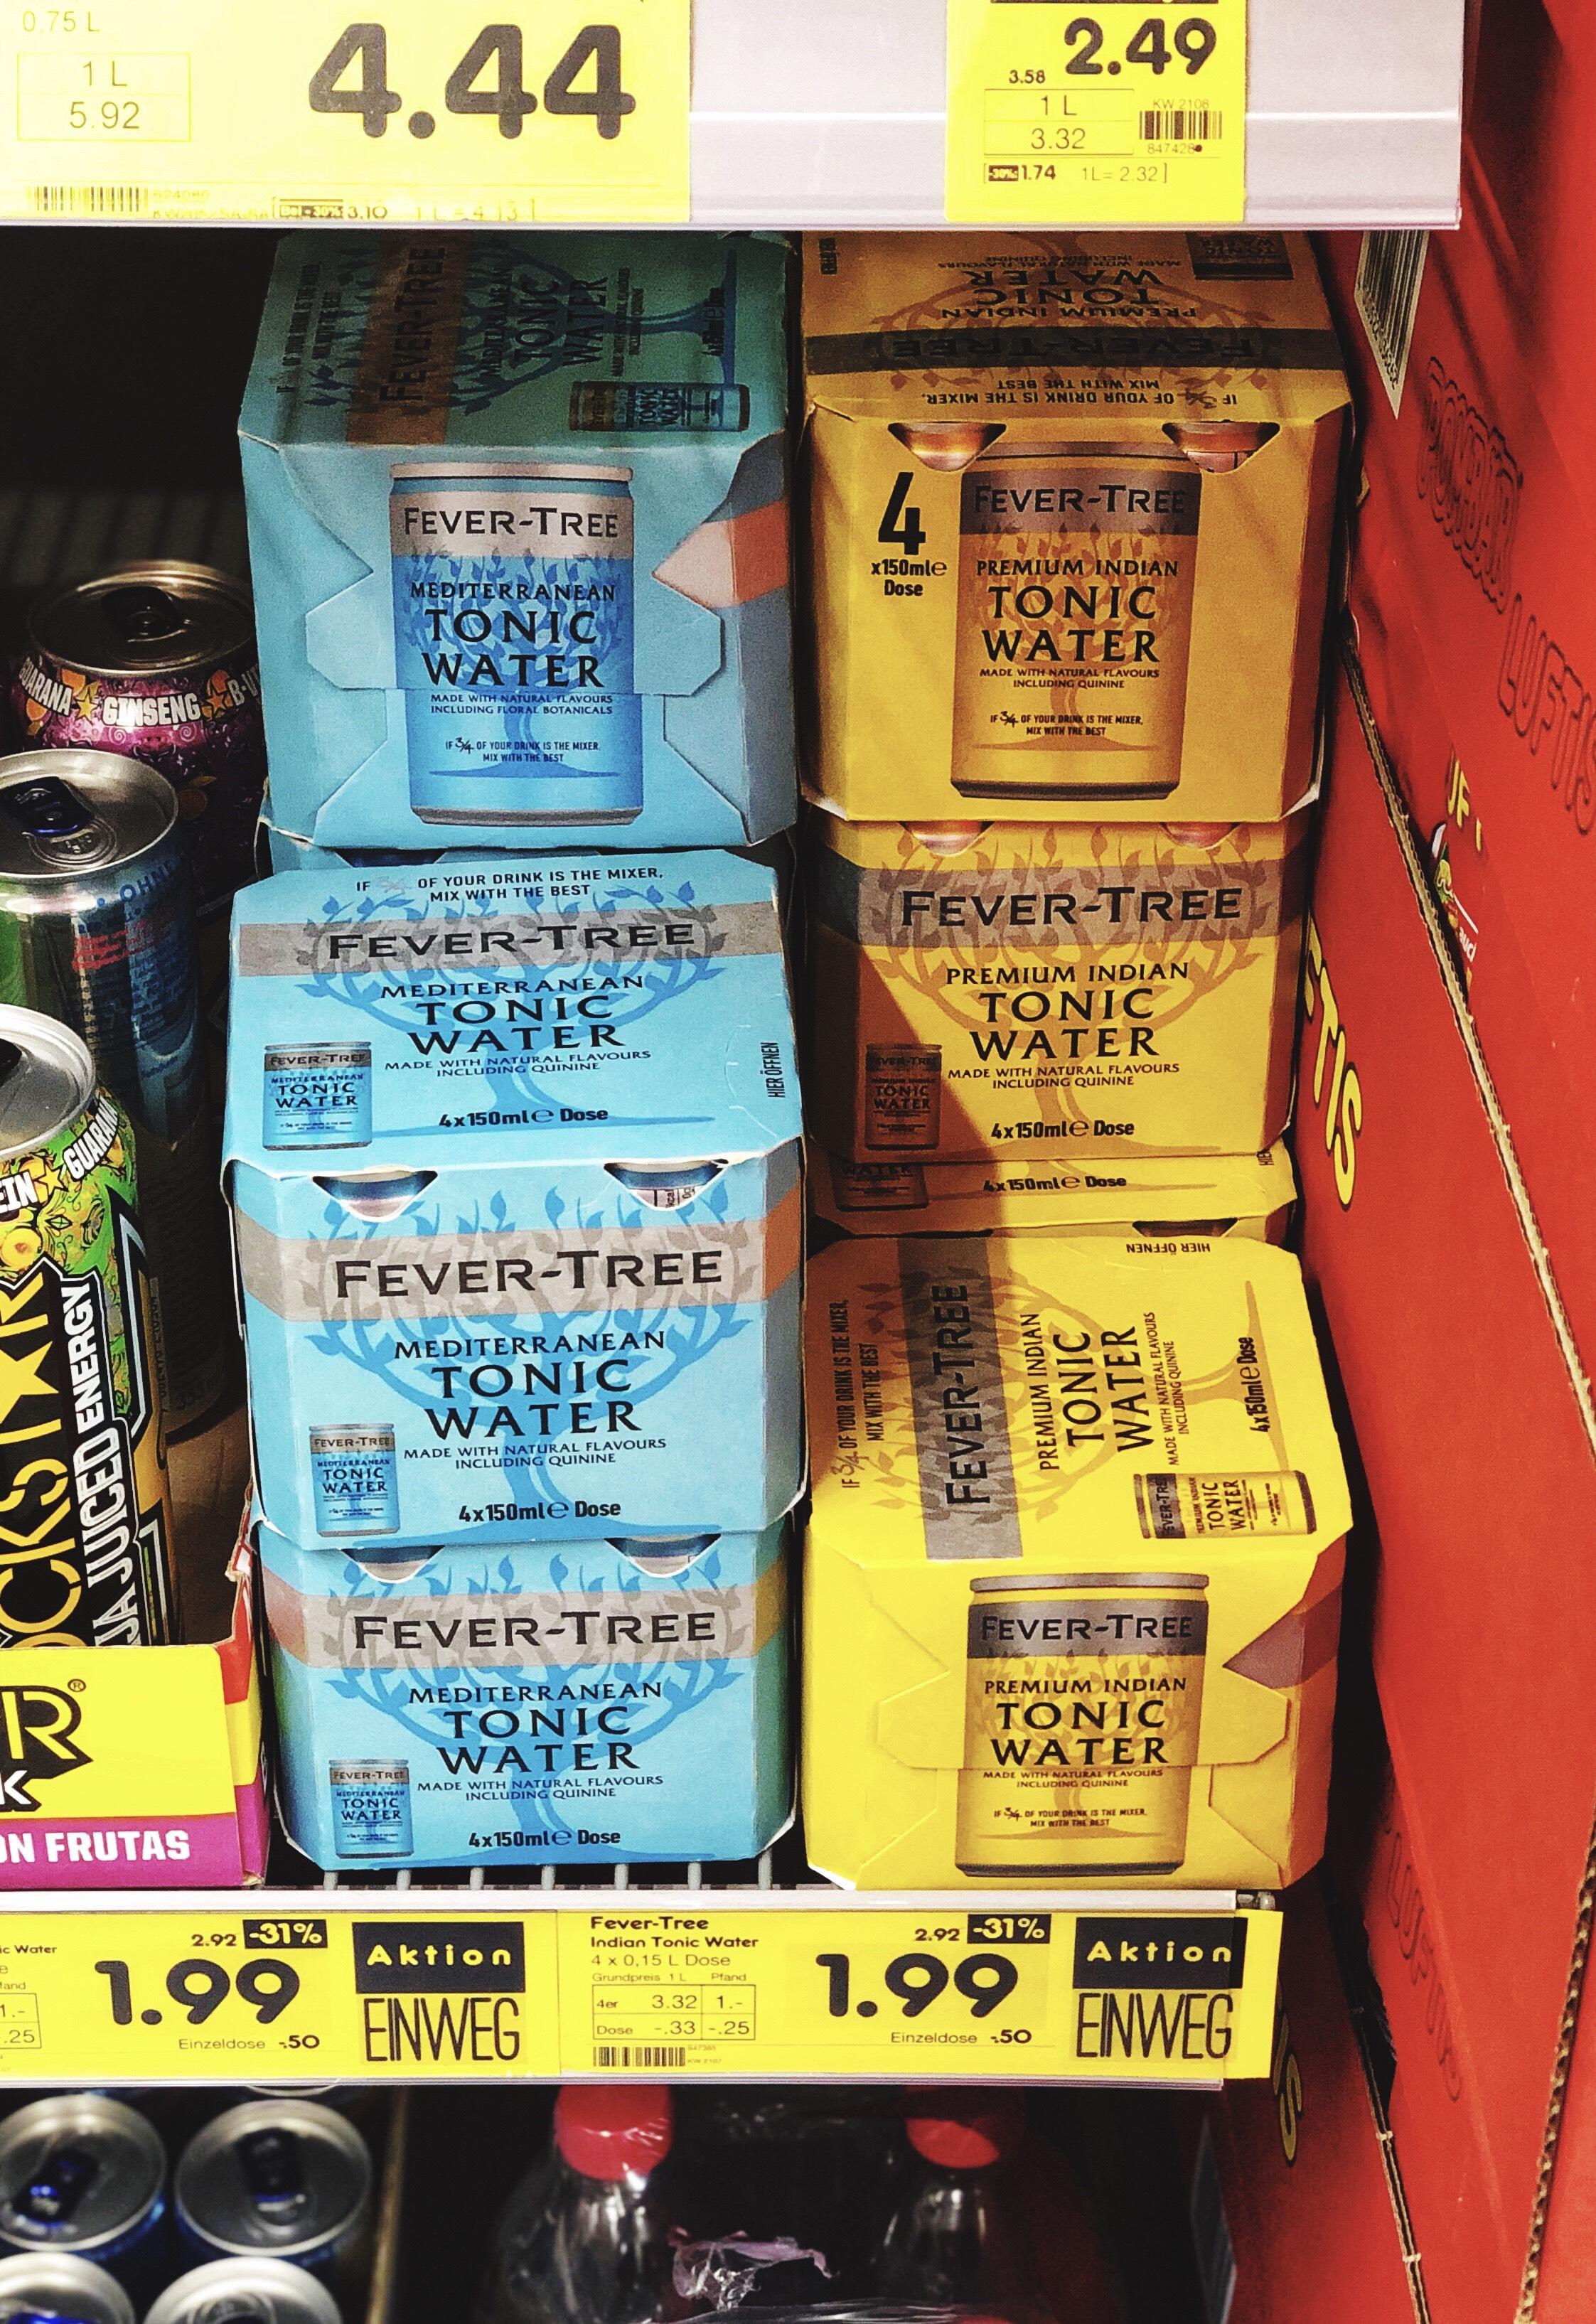 [LOKAL] Netto MD - HD/Pfaffengrund - Fever-Tree Premium Tonic Water (4 x 0,15l, vers. Sorten)